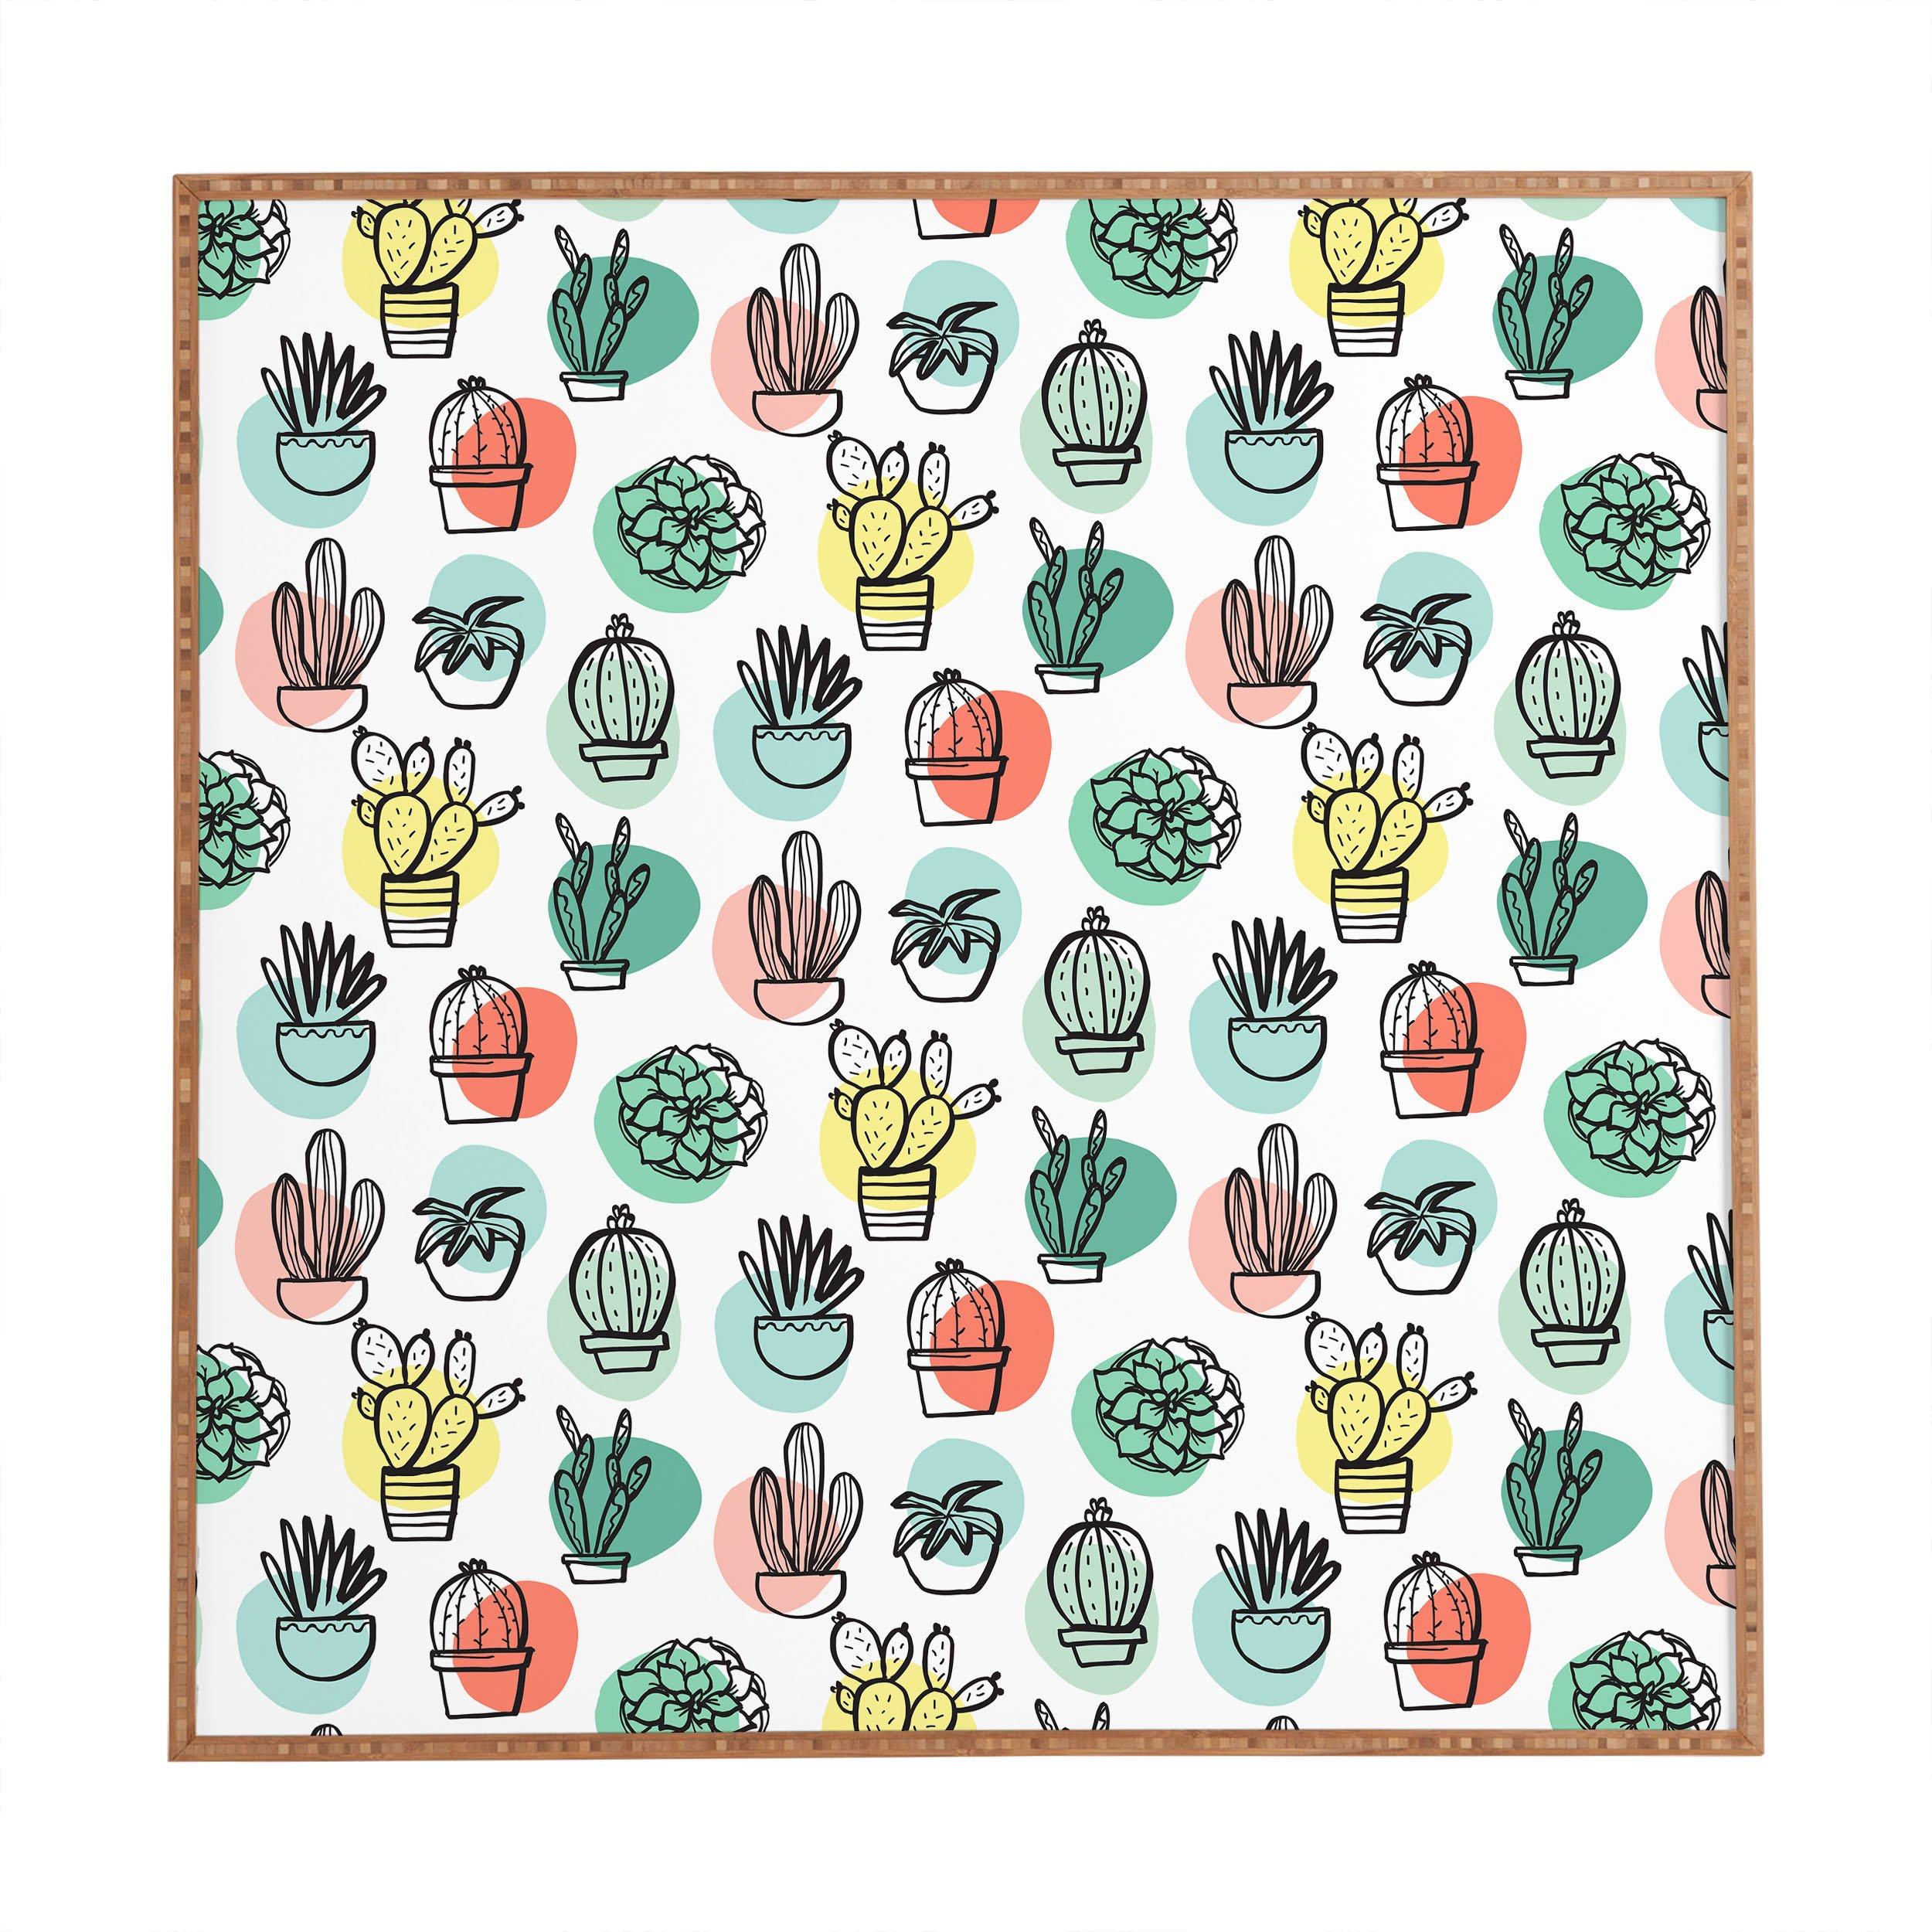 Deny Designs Zoe Wodarz, Summer Days Cactus, Framed Wall Art, Large, 30'' x 30''